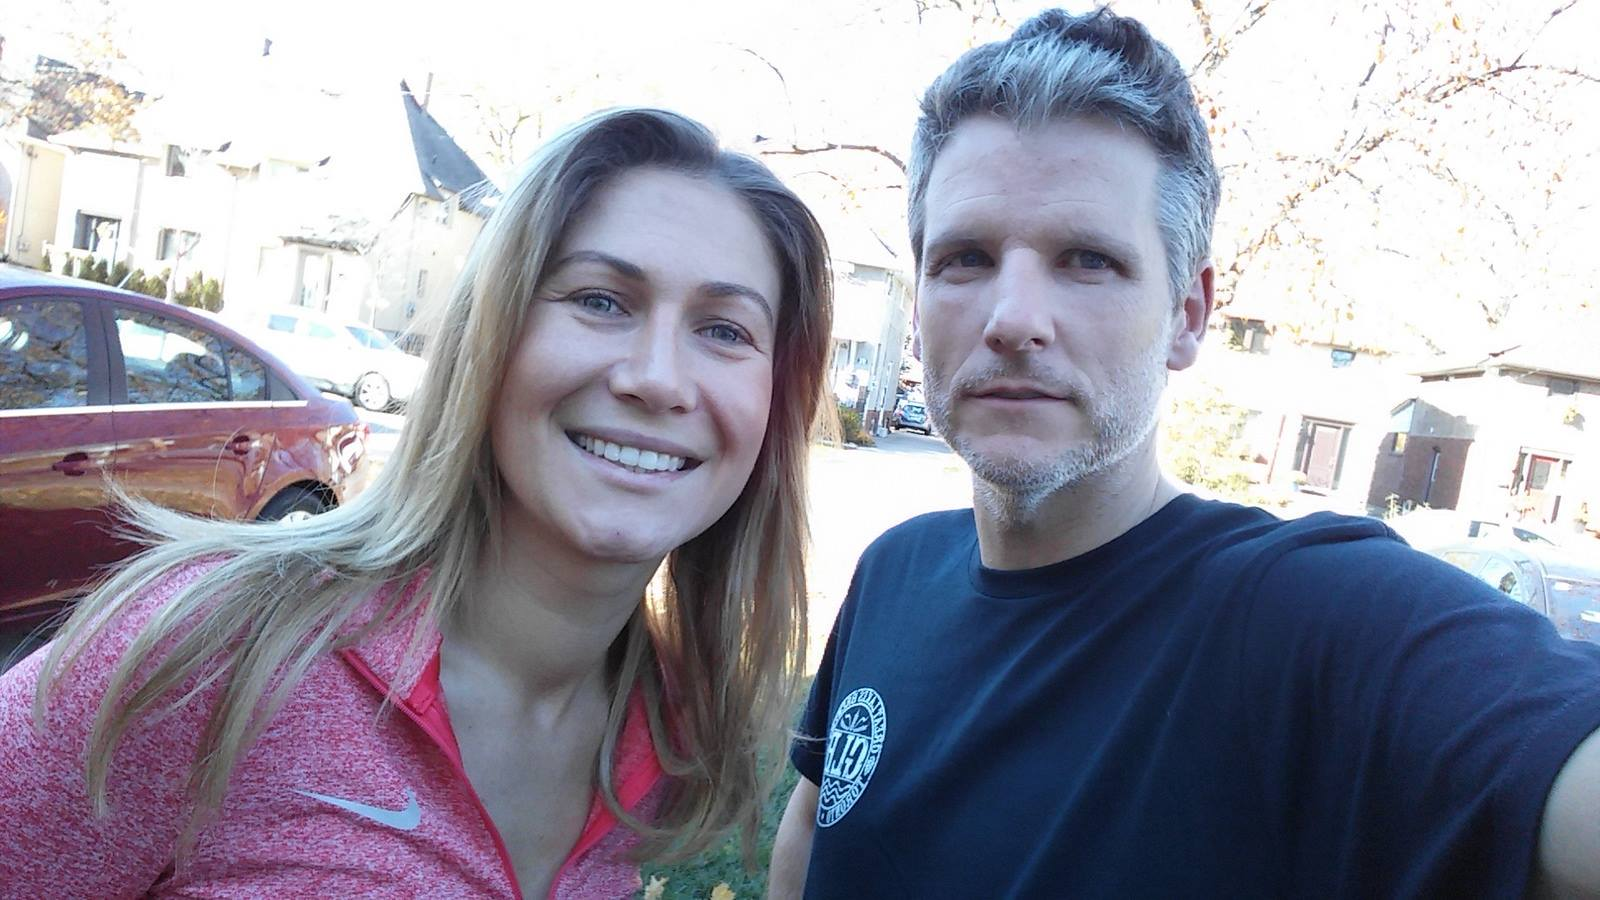 Toronto Mike'd Podcast Episode 203: Sophia Jurksztowicz